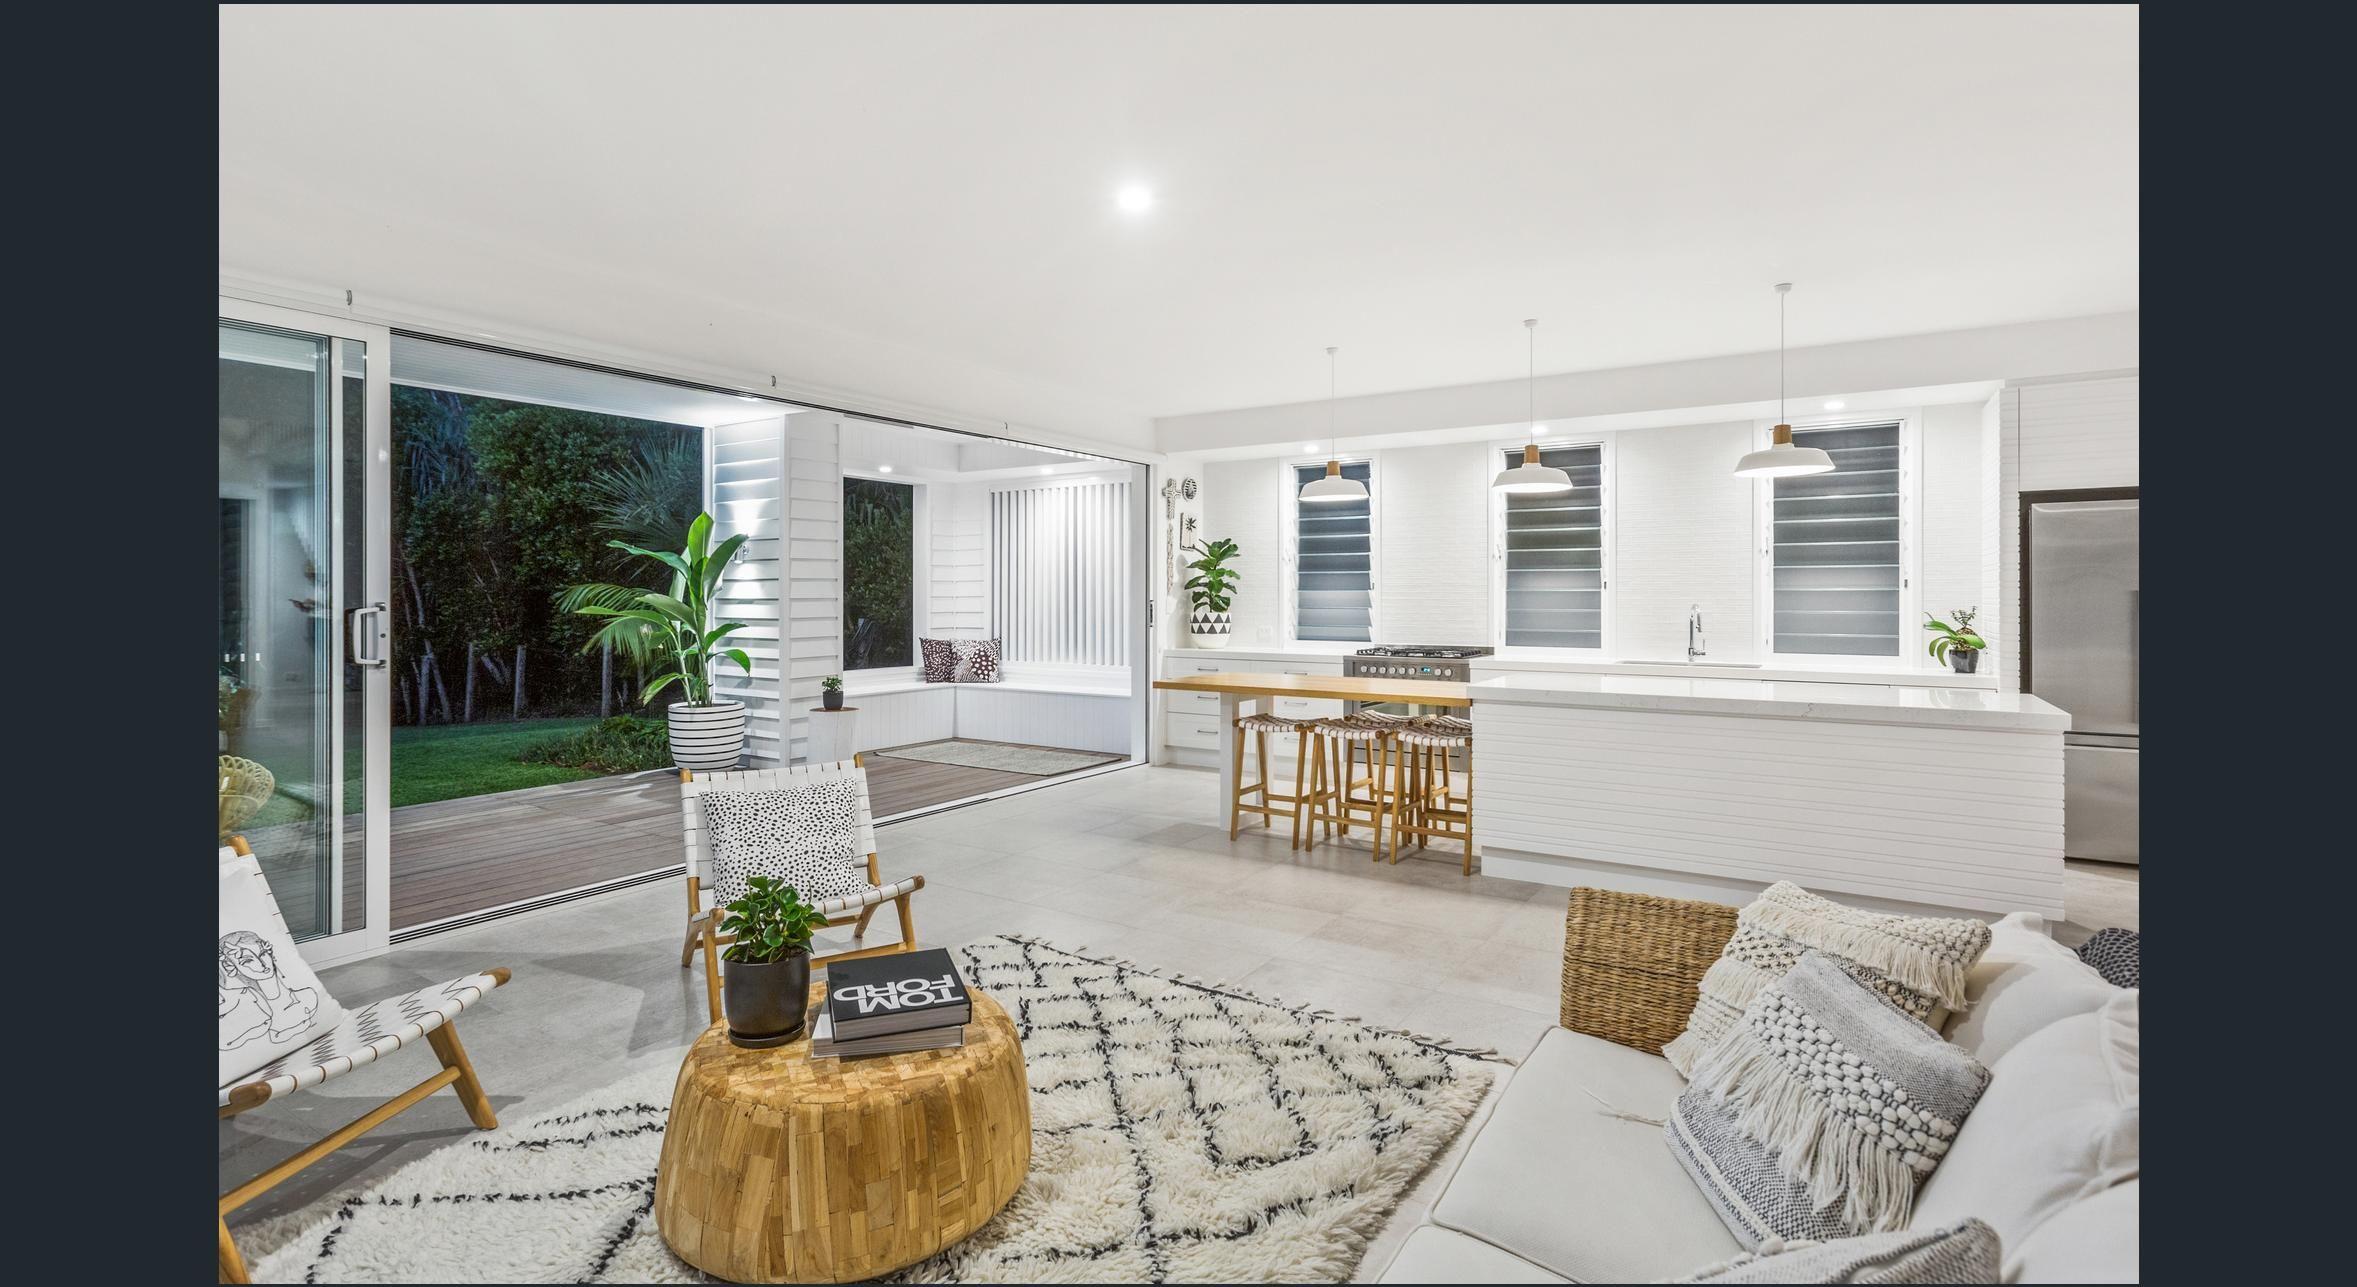 10 Beason Court, Casuarina, NSW 2487 House for Sale